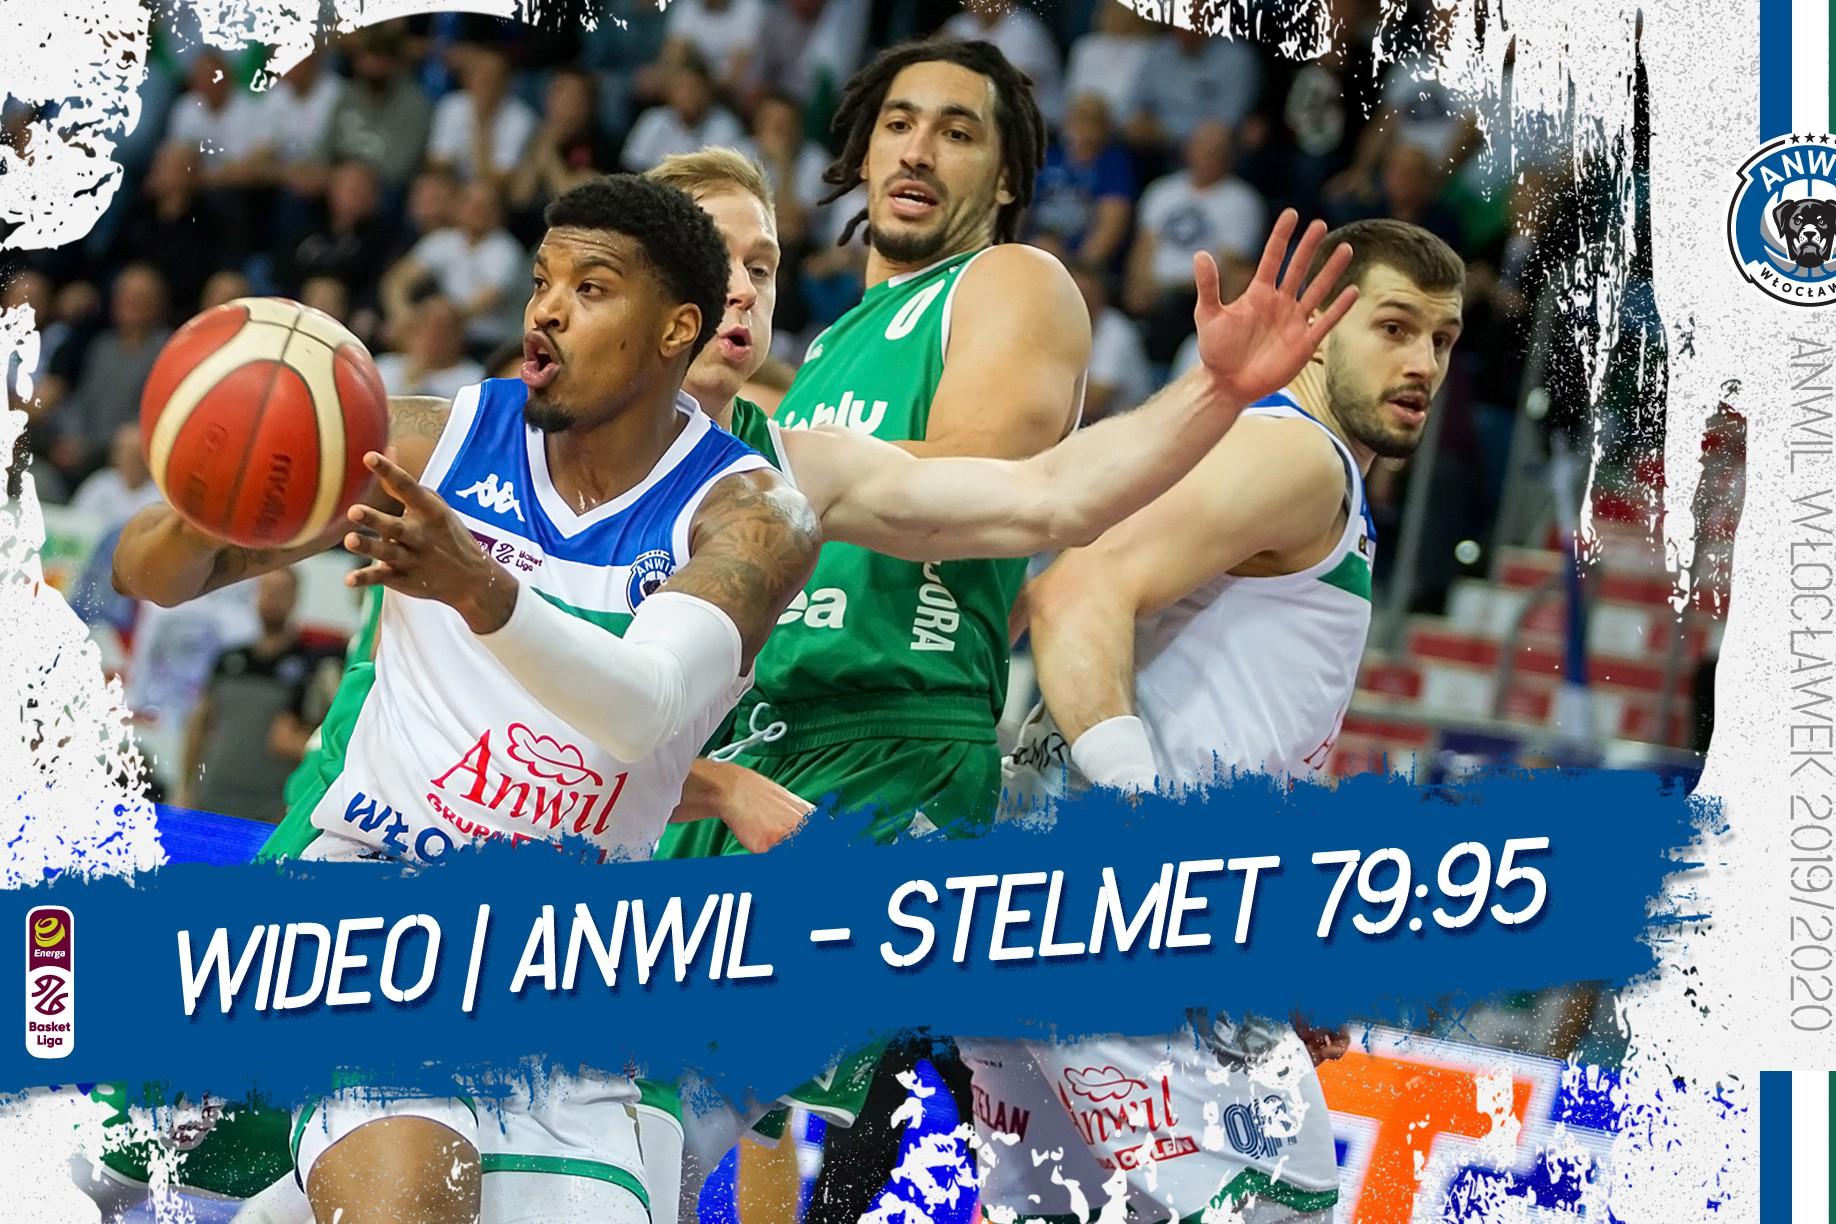 Wideo   Anwil Włocławek - Stelmet Enea BC Zielona Góra 79:95